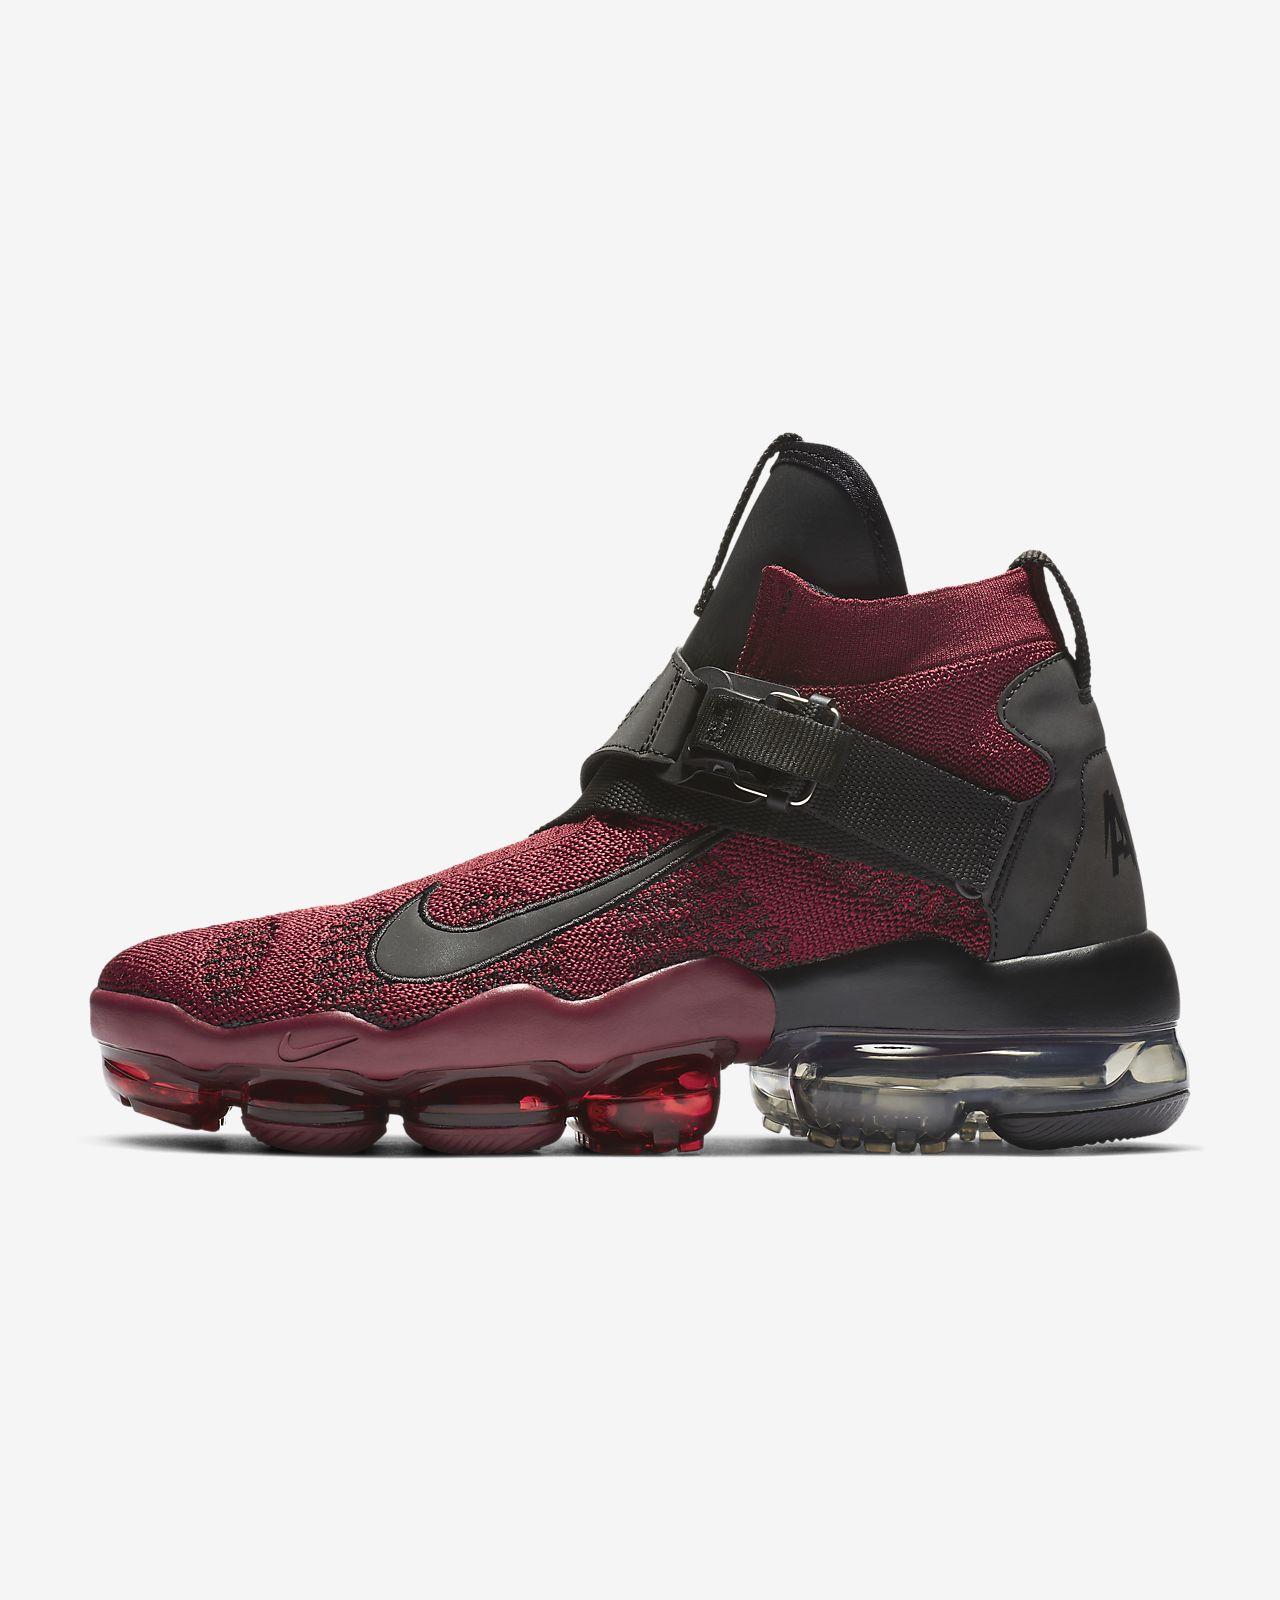 Nike Air VaporMax Premier Flyknit Men's Shoe